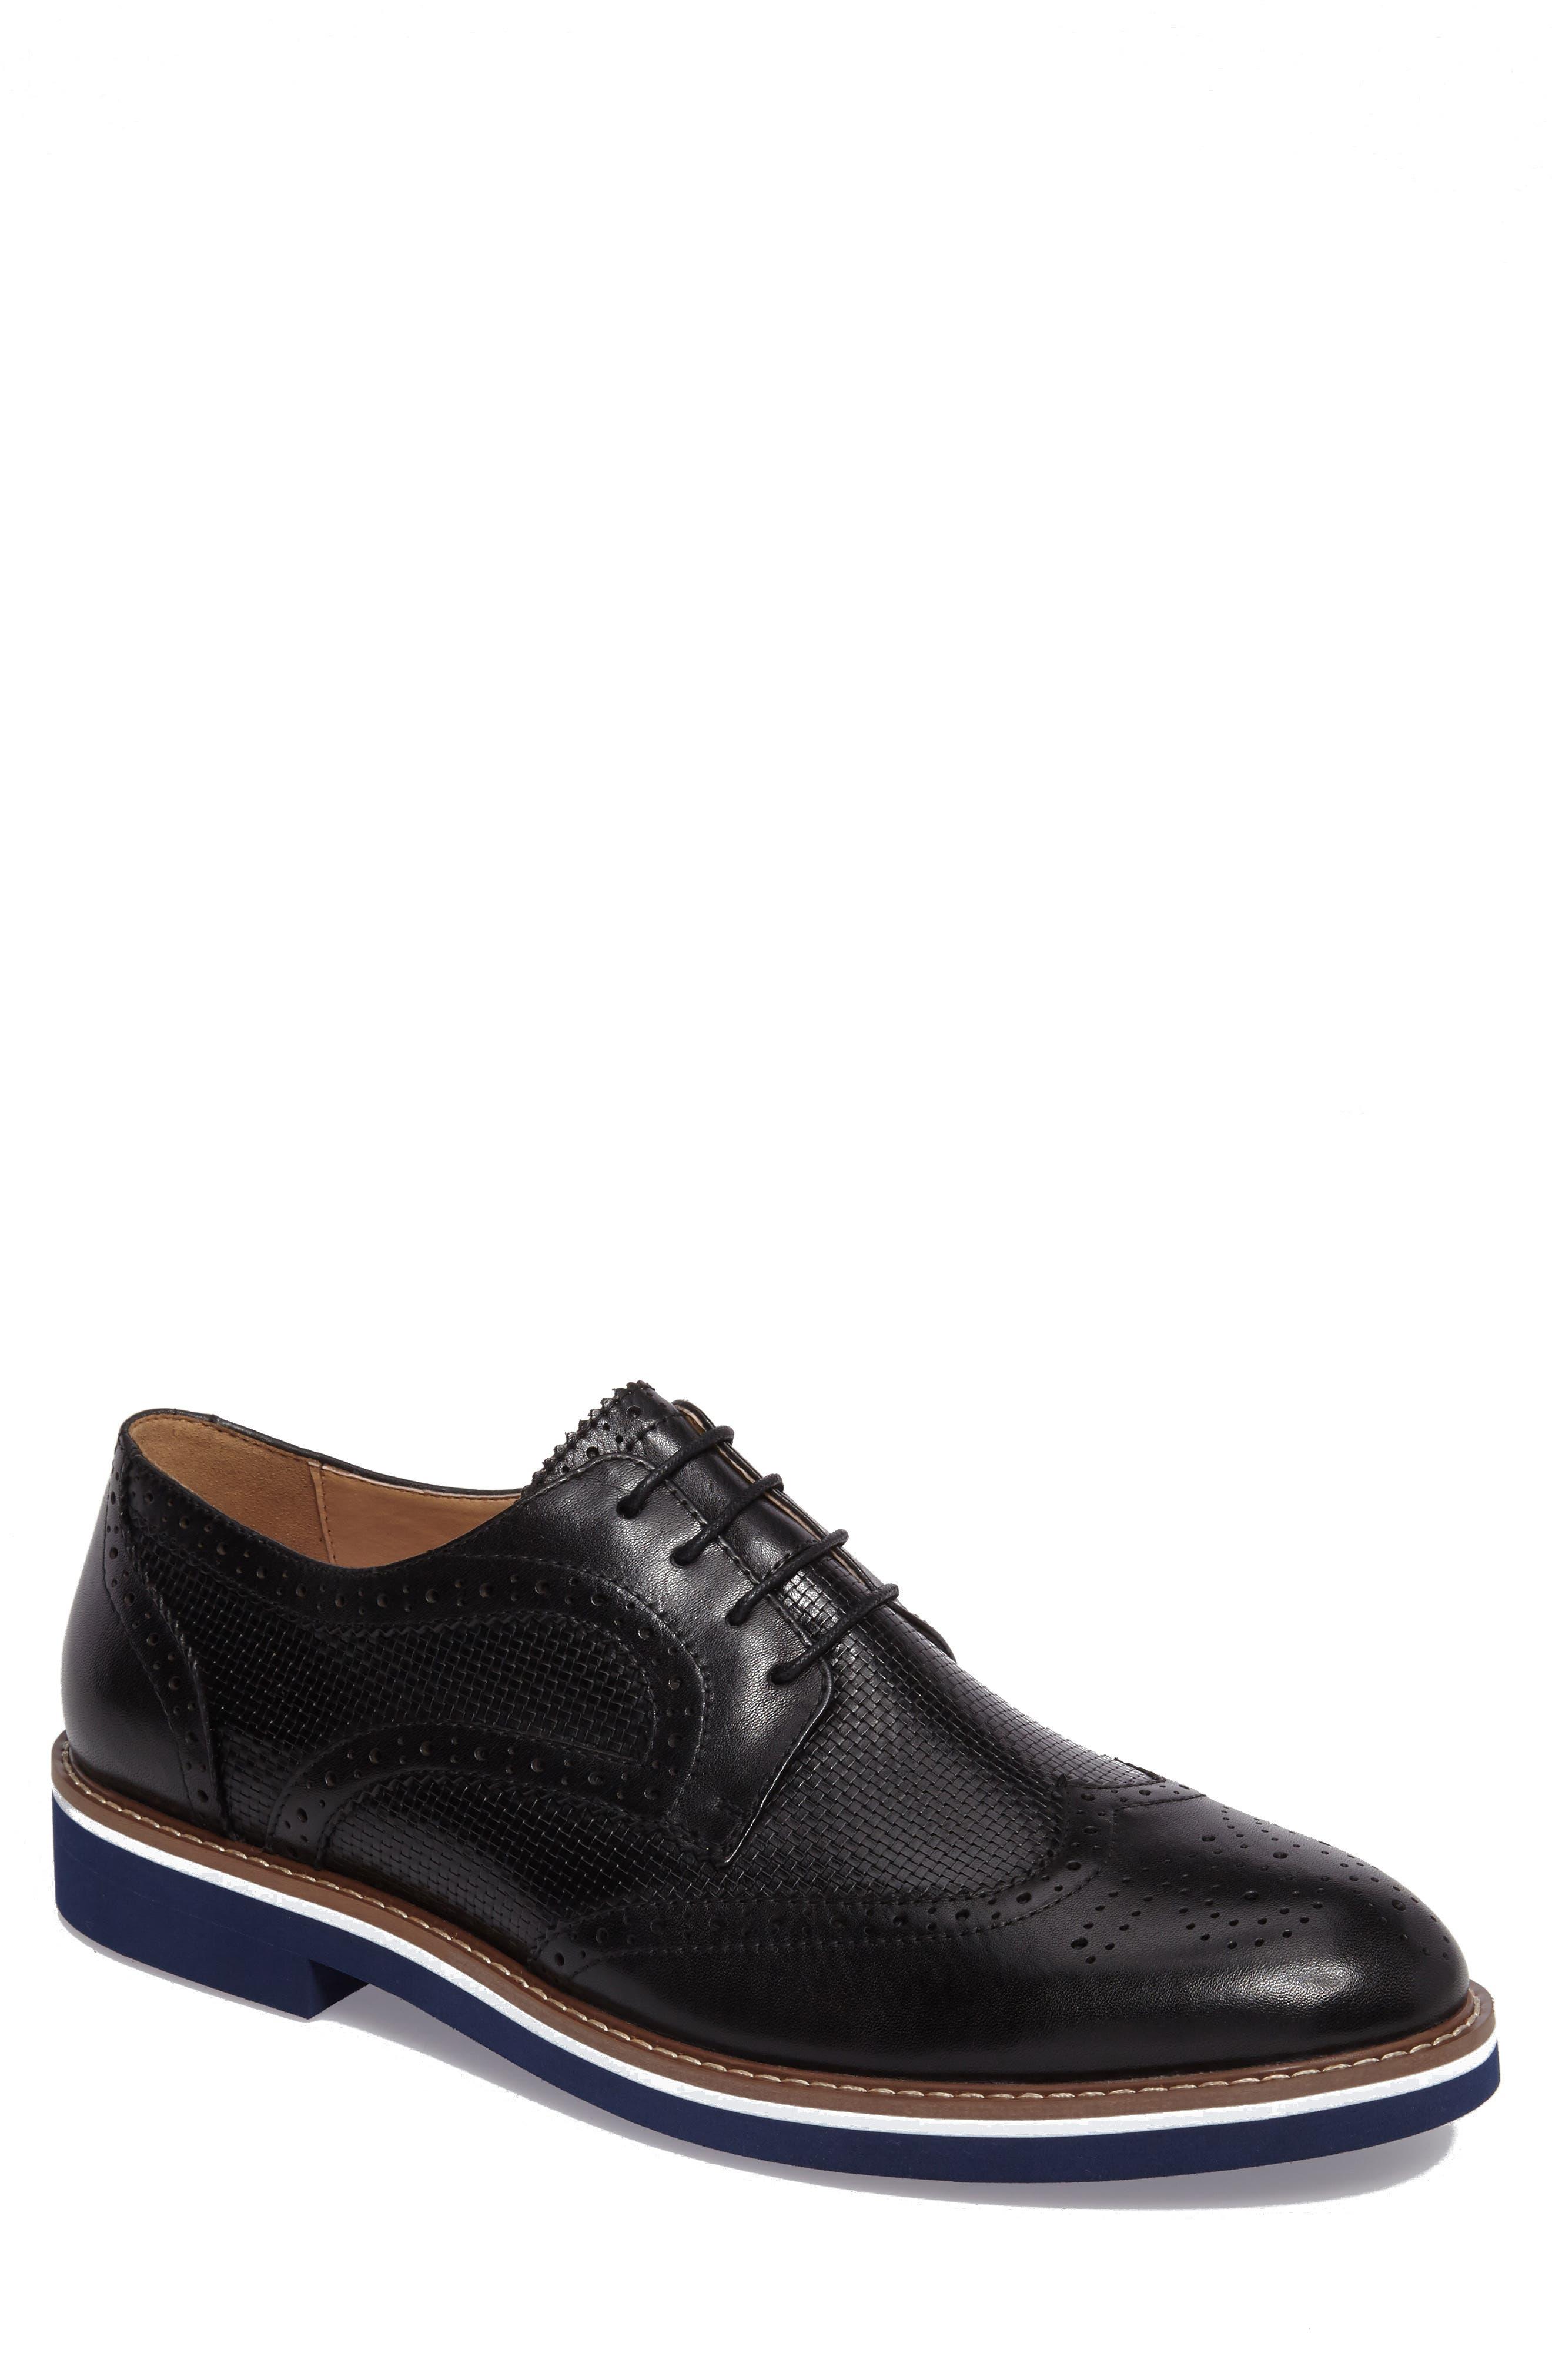 Northfields Spectator Shoe,                         Main,                         color, 001